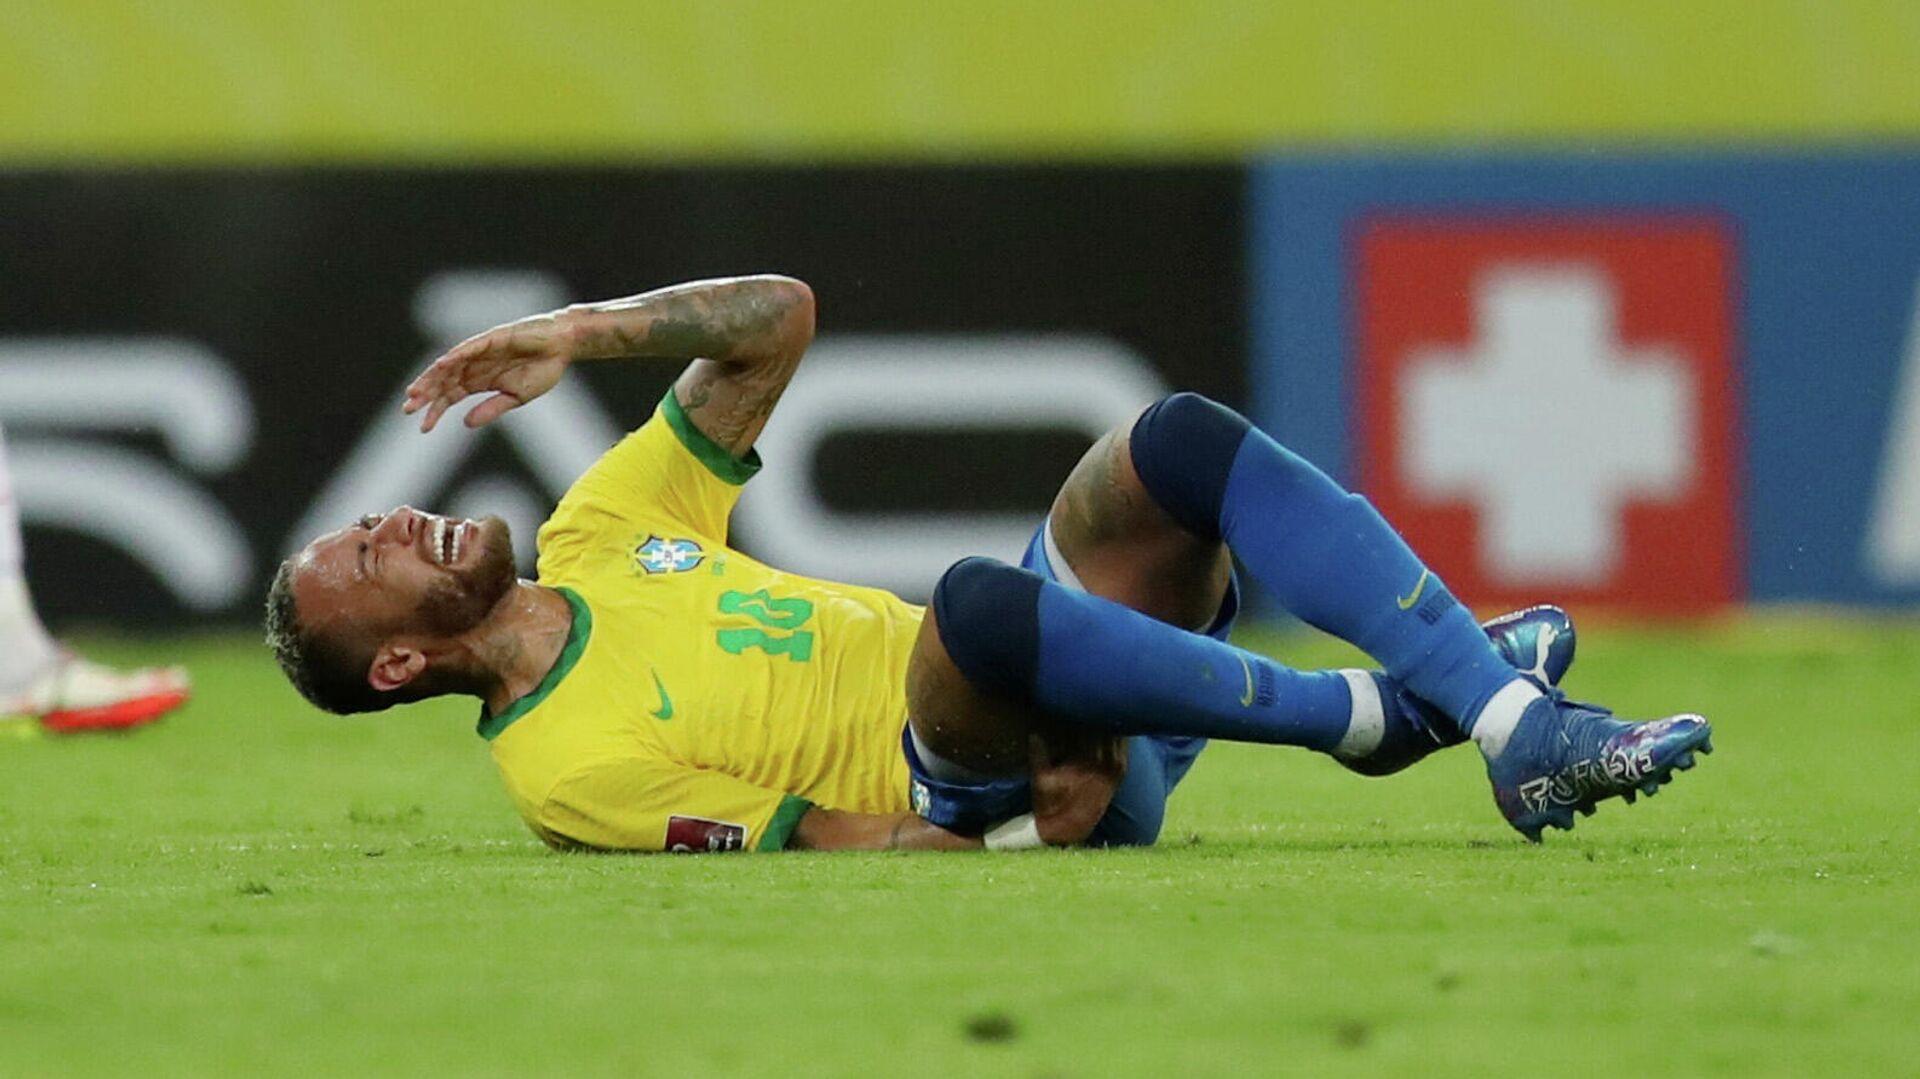 September 9, 2021 Brazil's Neymar reacts after sustaining an injury - Sputnik International, 1920, 14.09.2021